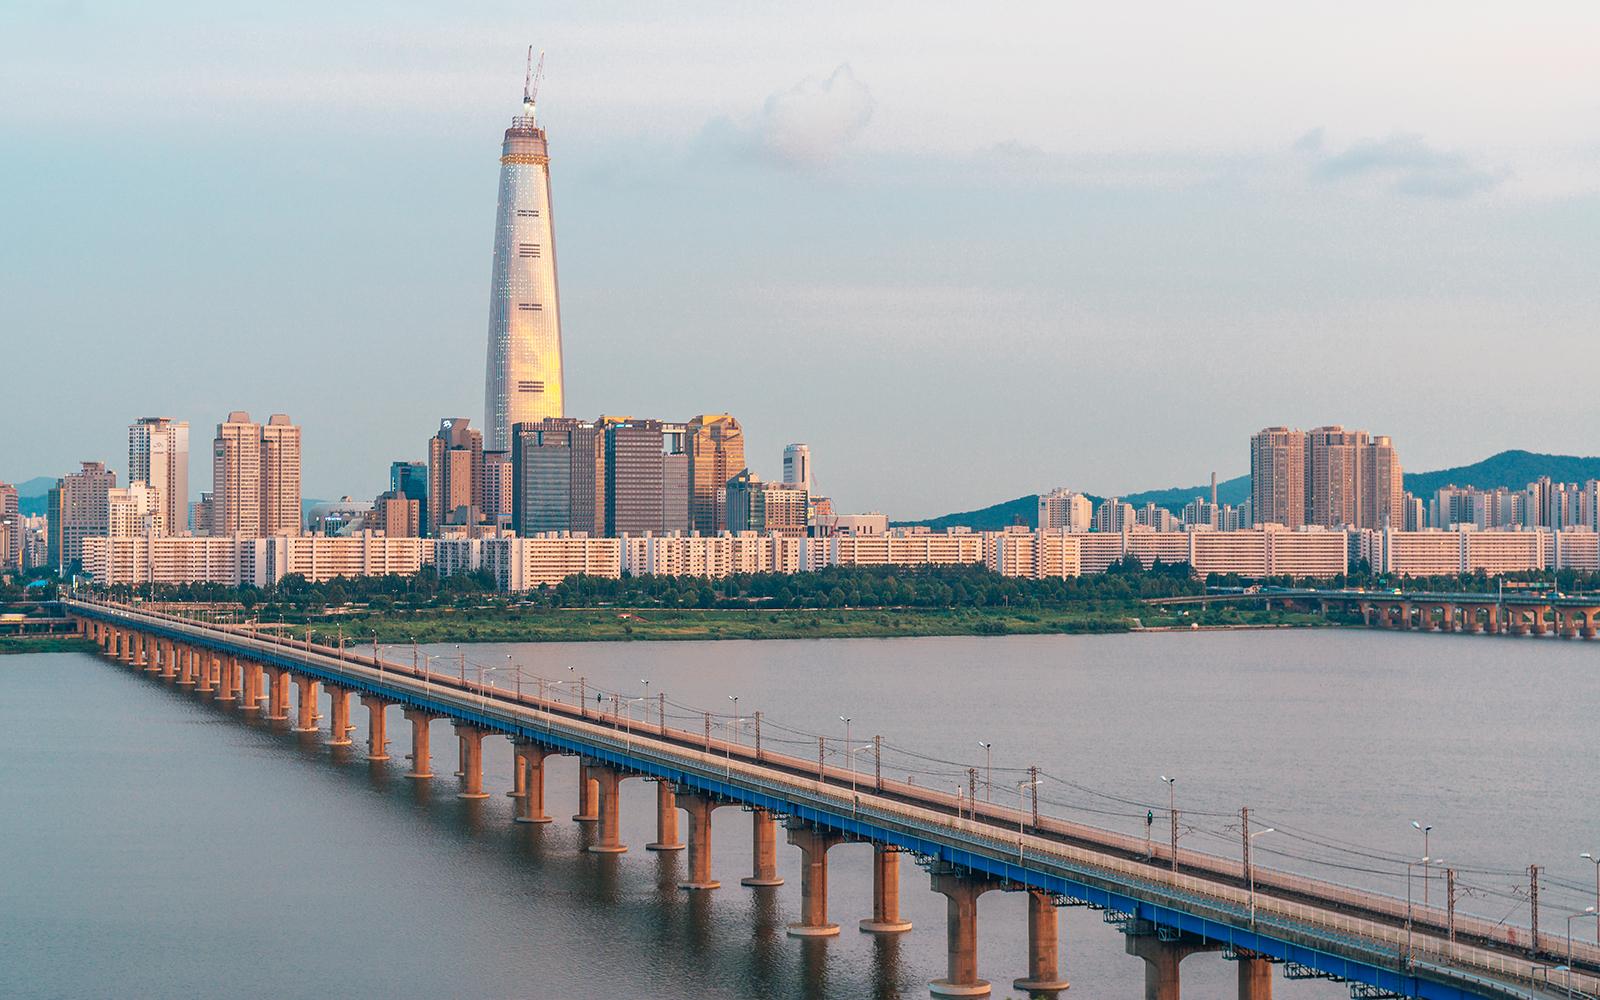 10 edificios más altos 2016 1 - Lotte World Tower